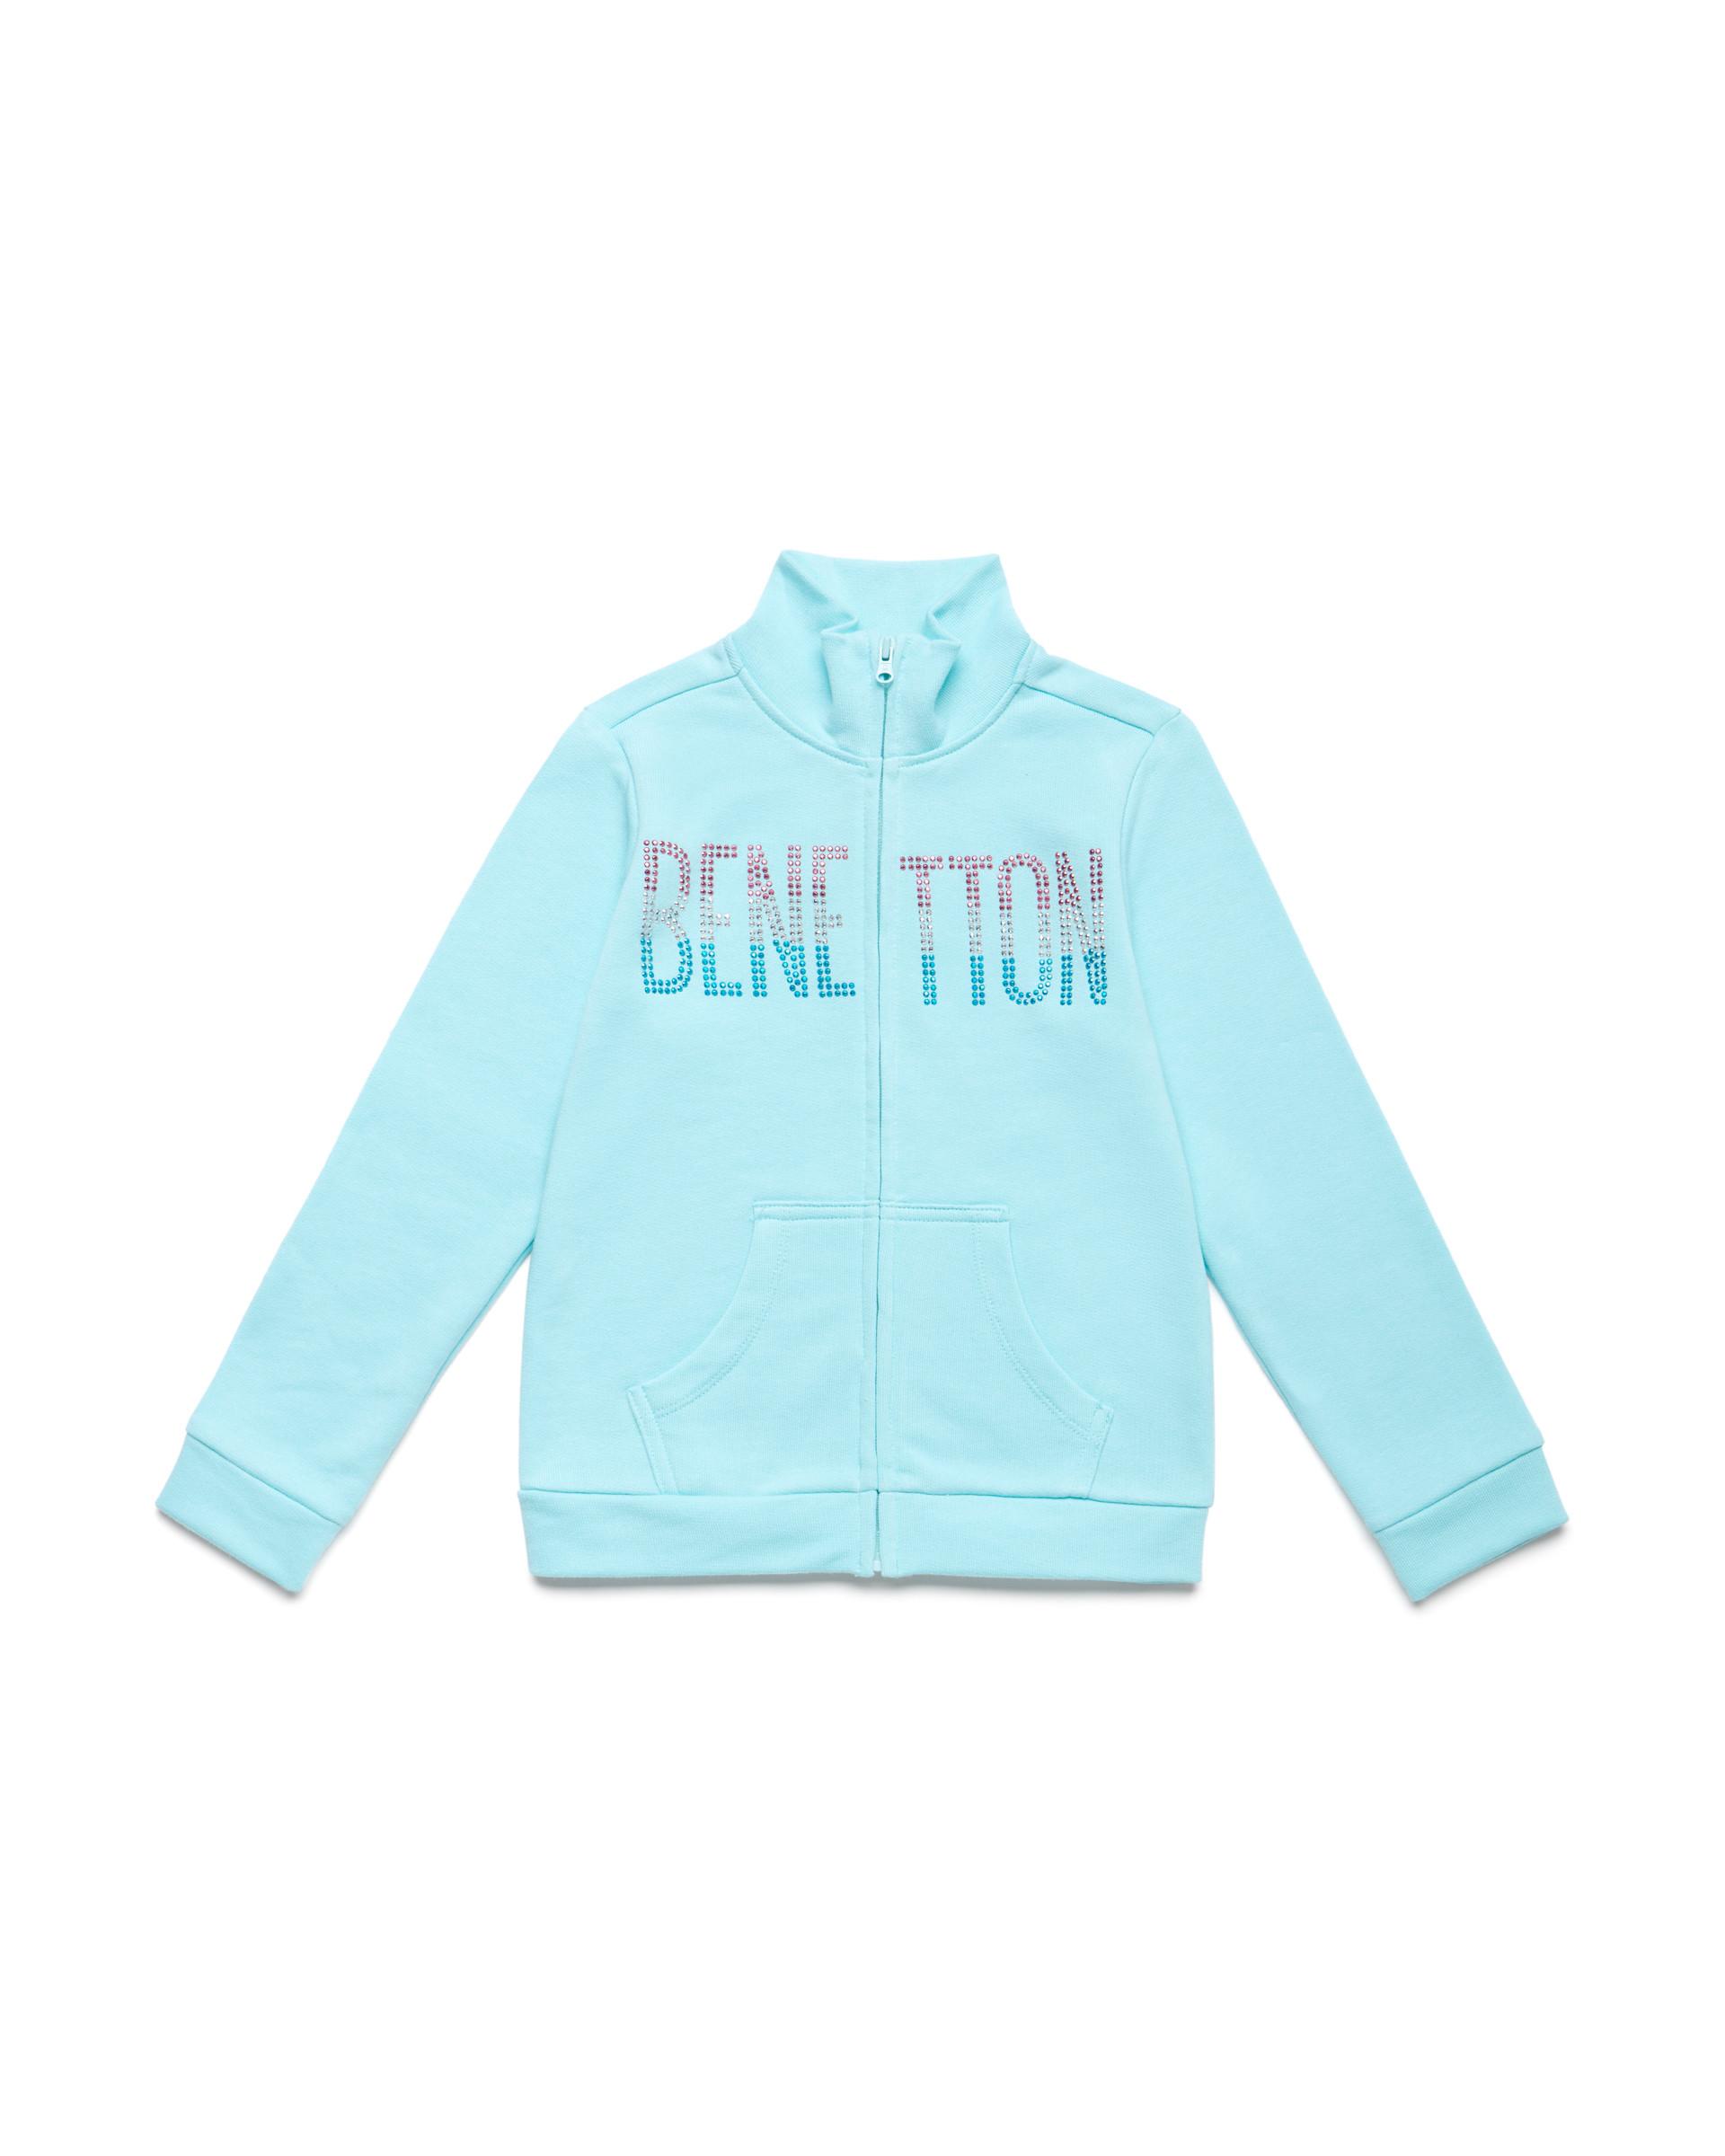 Купить 20P_3J68C5793_0Z8, Толстовка для девочек Benetton 3J68C5793_0Z8 р-р 122, United Colors of Benetton, Толстовки для девочек